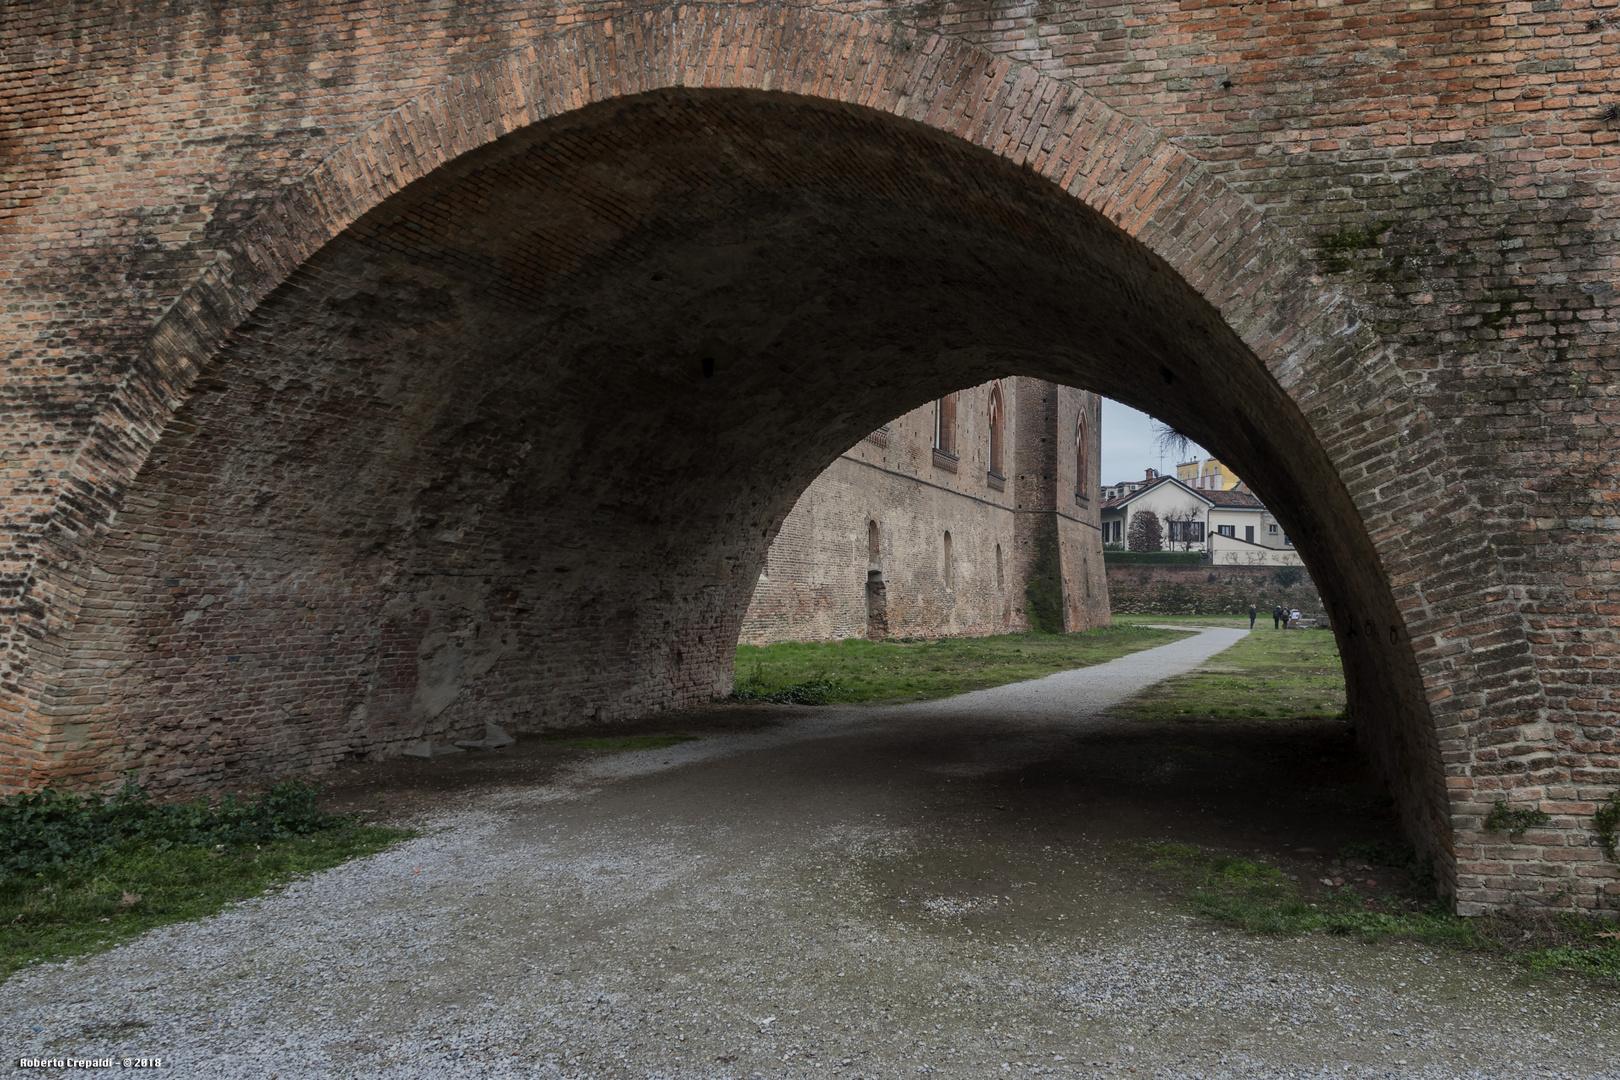 Castello Visconteo, Pavia